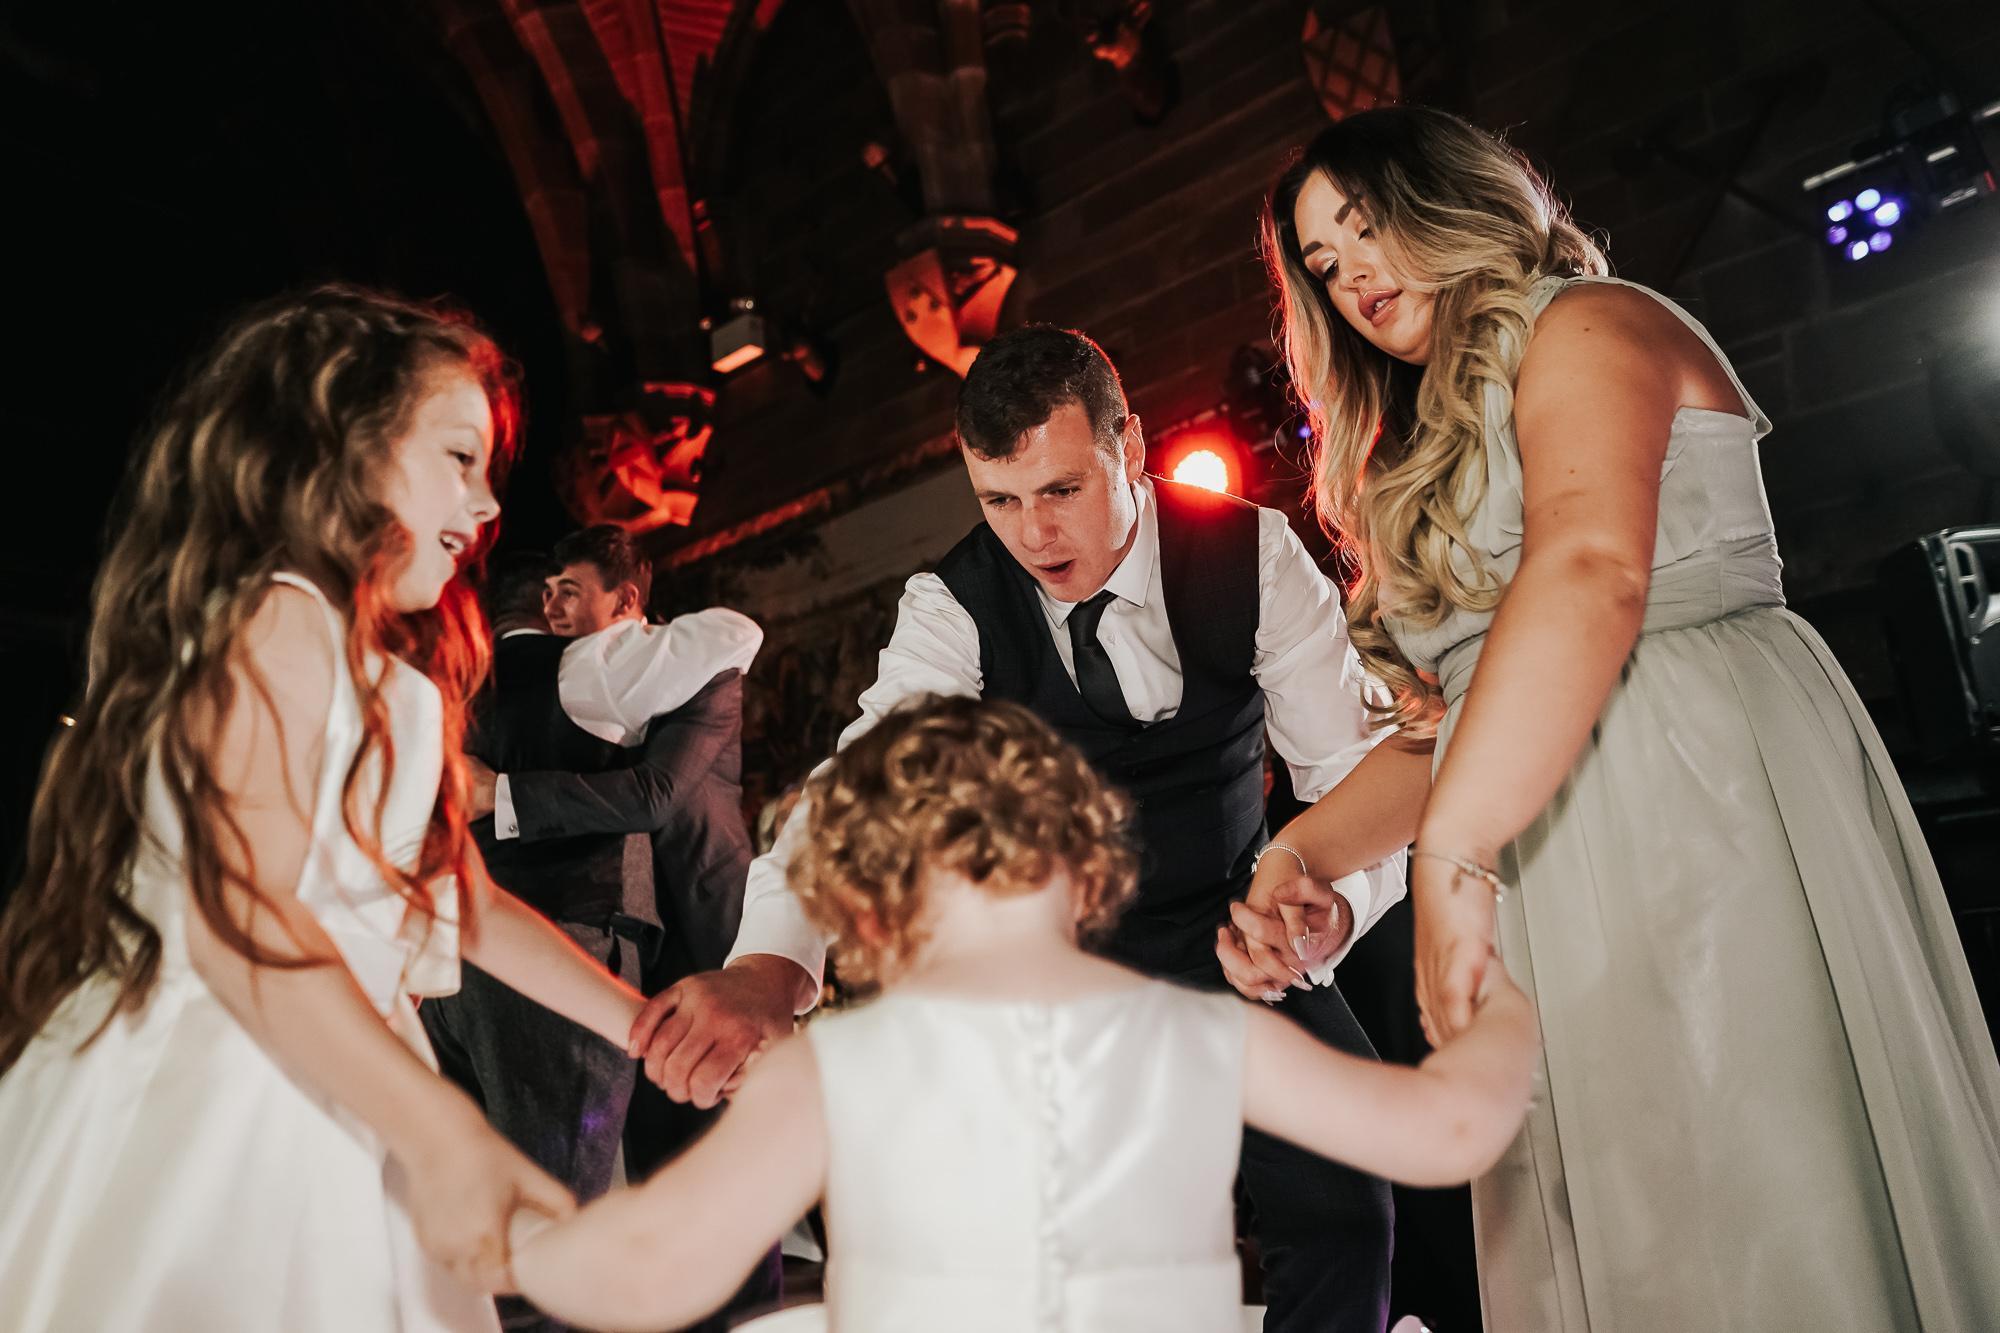 Peckforton Castle wedding photography cheshire wedding photographer (55 of 57).jpg